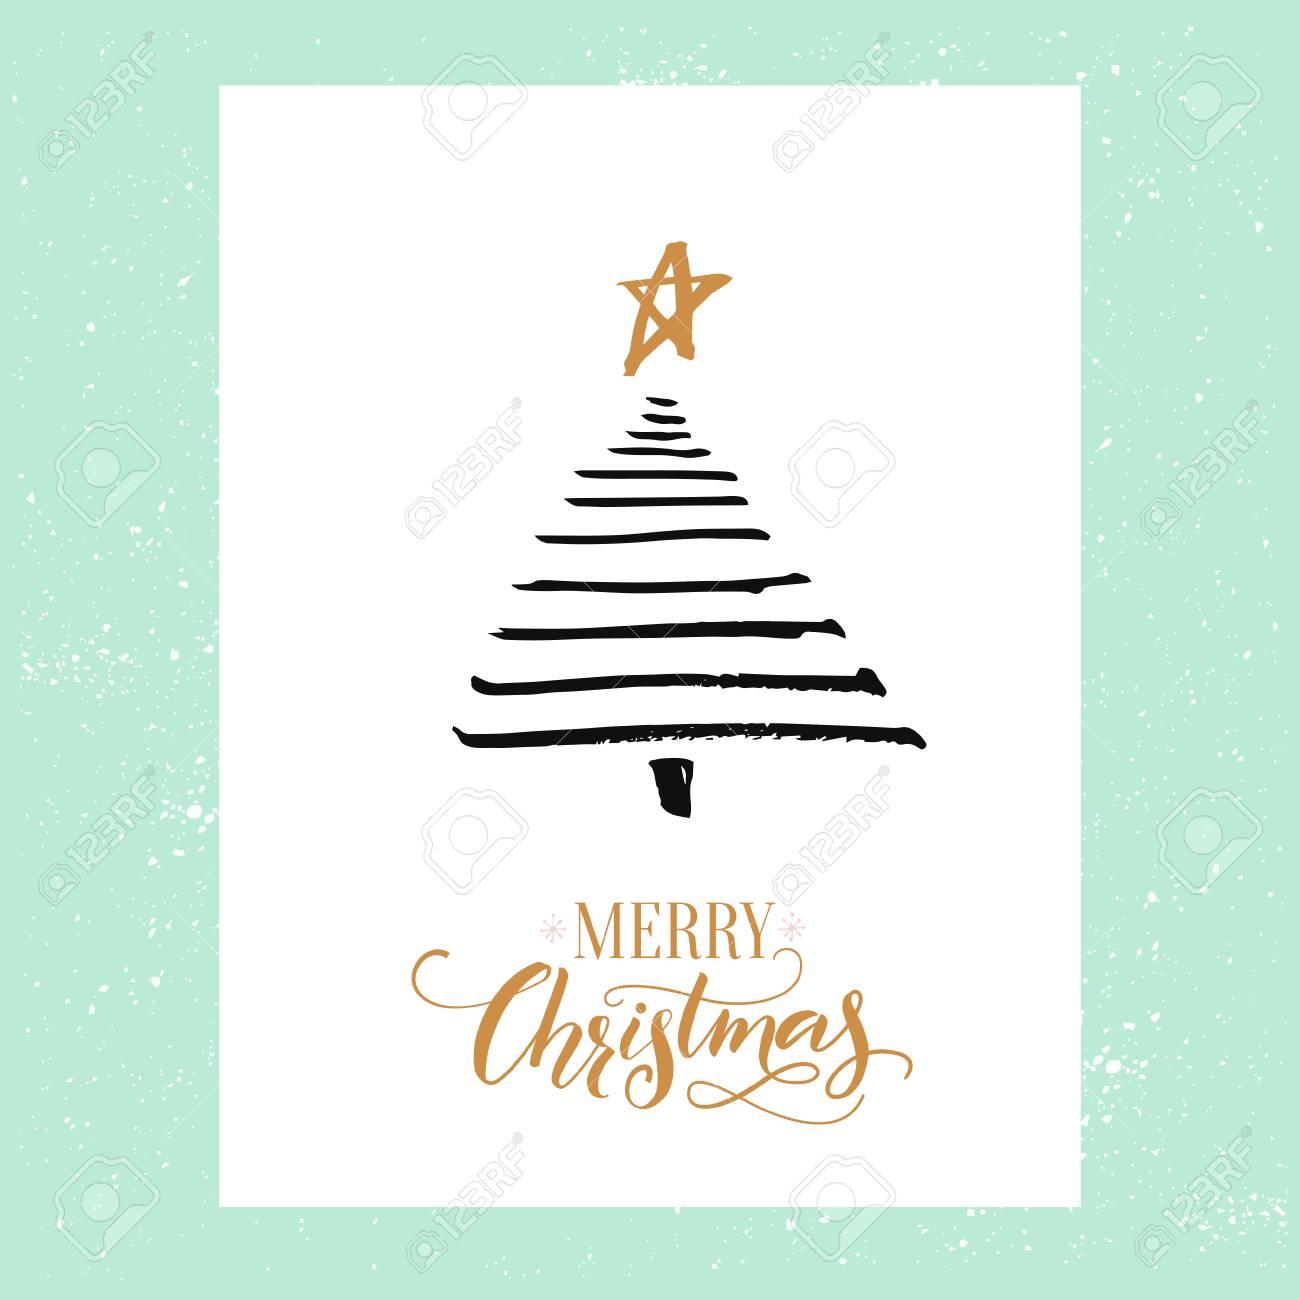 Minimalistic Christmas Greeting Card Design Simple Hand Drawn